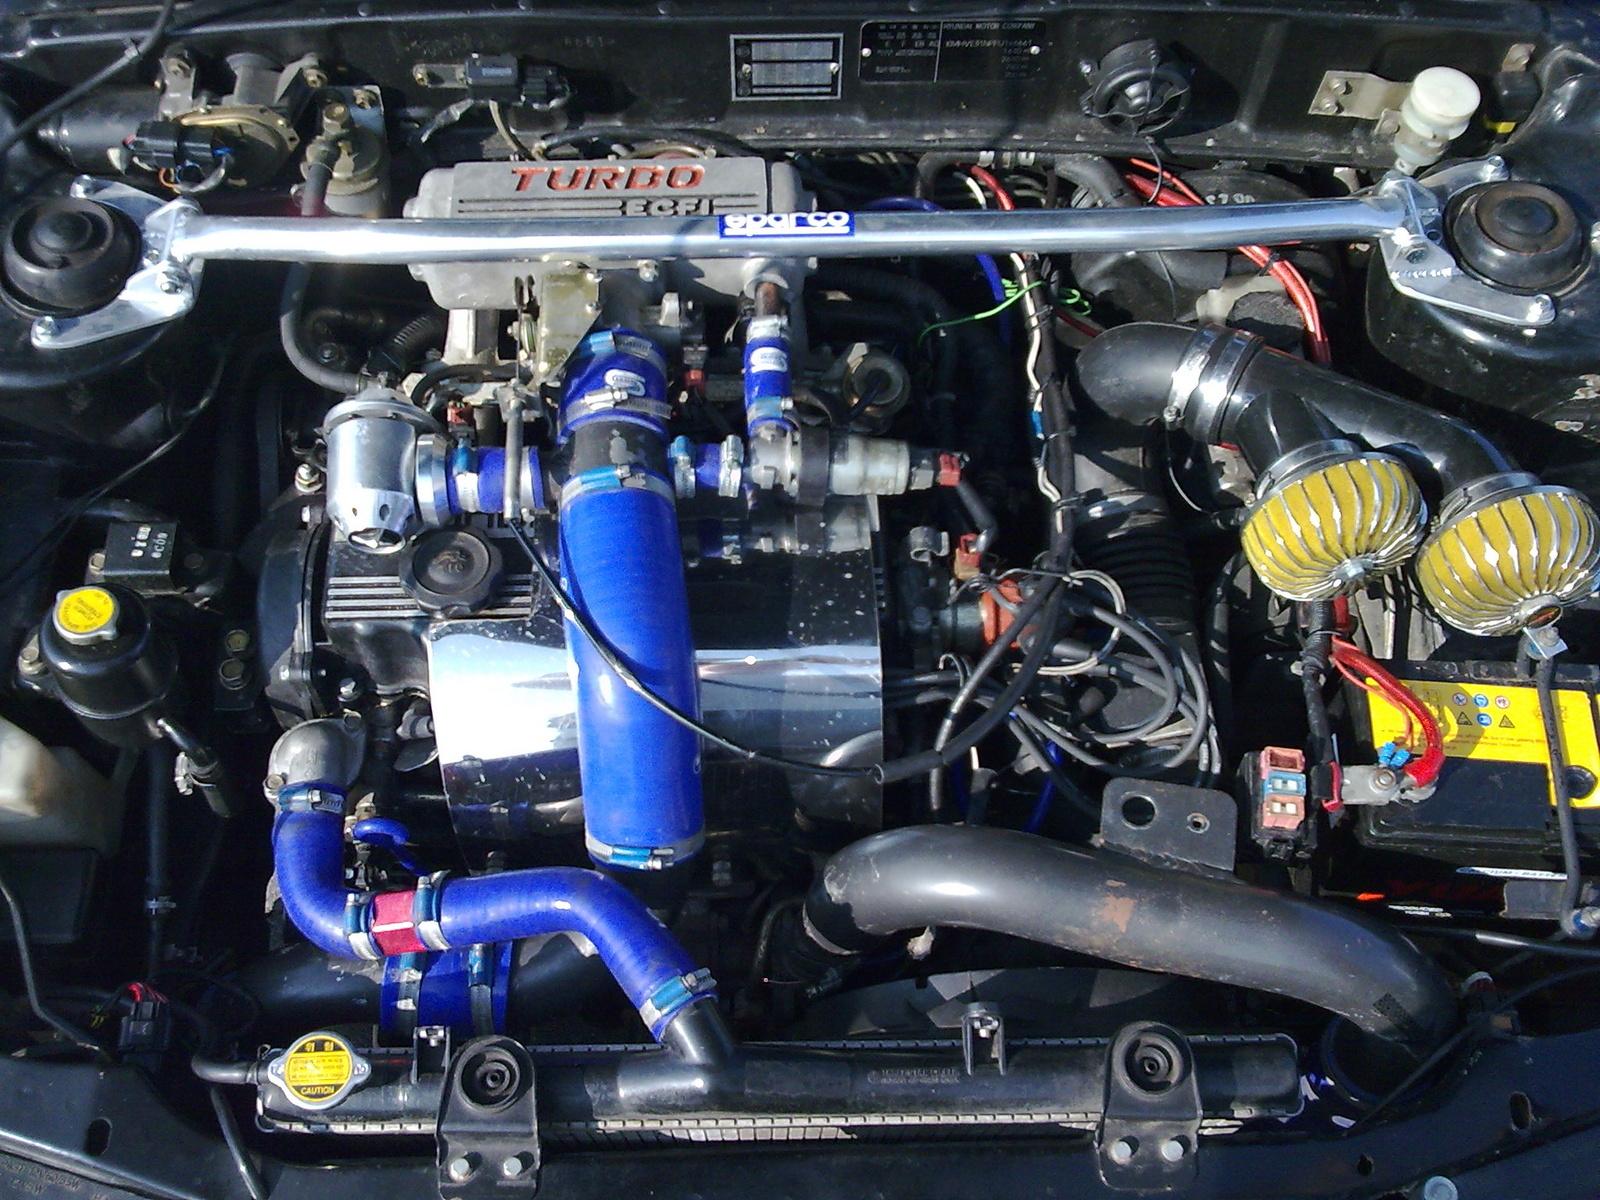 1993 Hyundai Scoupe 2 Dr Turbo Coupe - Pictures - 1993 Hyundai Scoupe ...